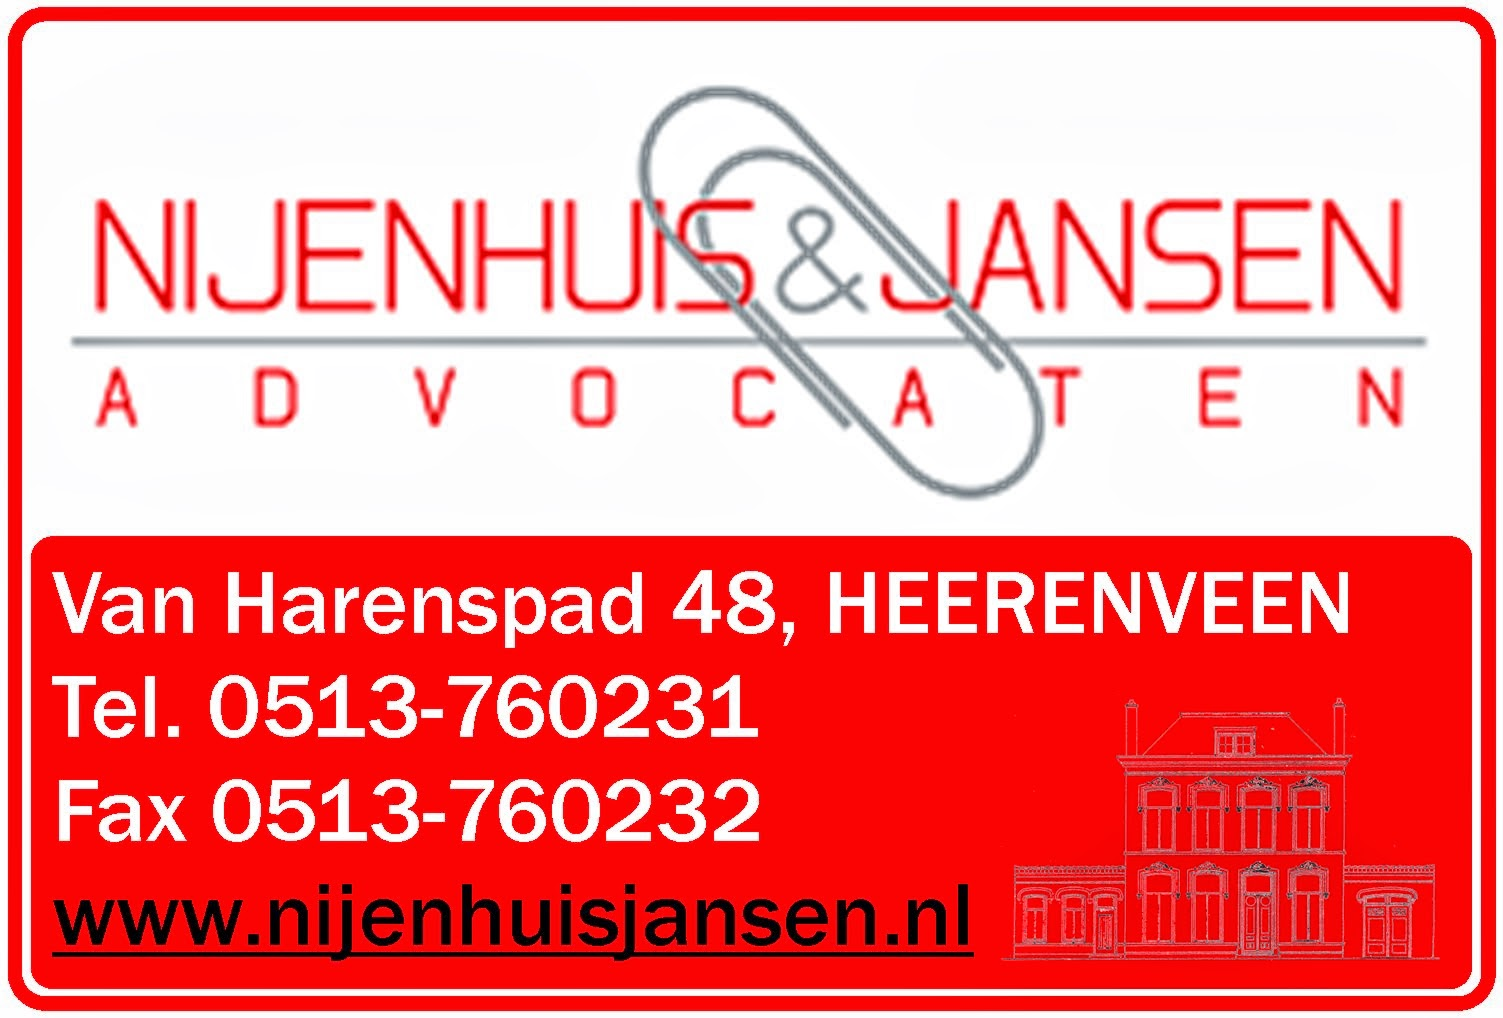 Sponsor: Nijenhuis & Jansen Advocaten